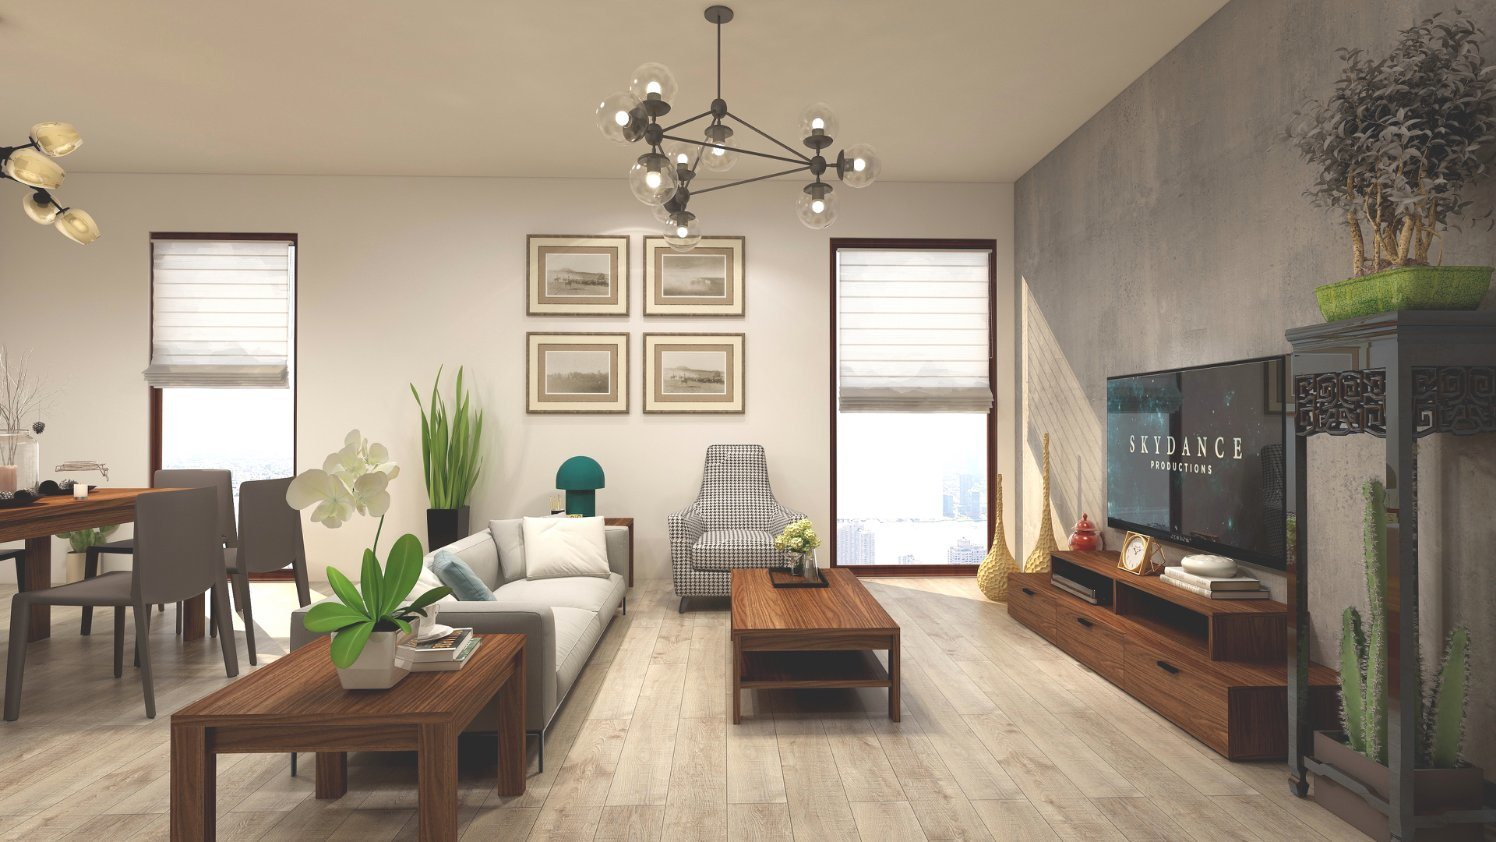 [Hot Item] Dark Walnut Wooden Furniture for Living Room